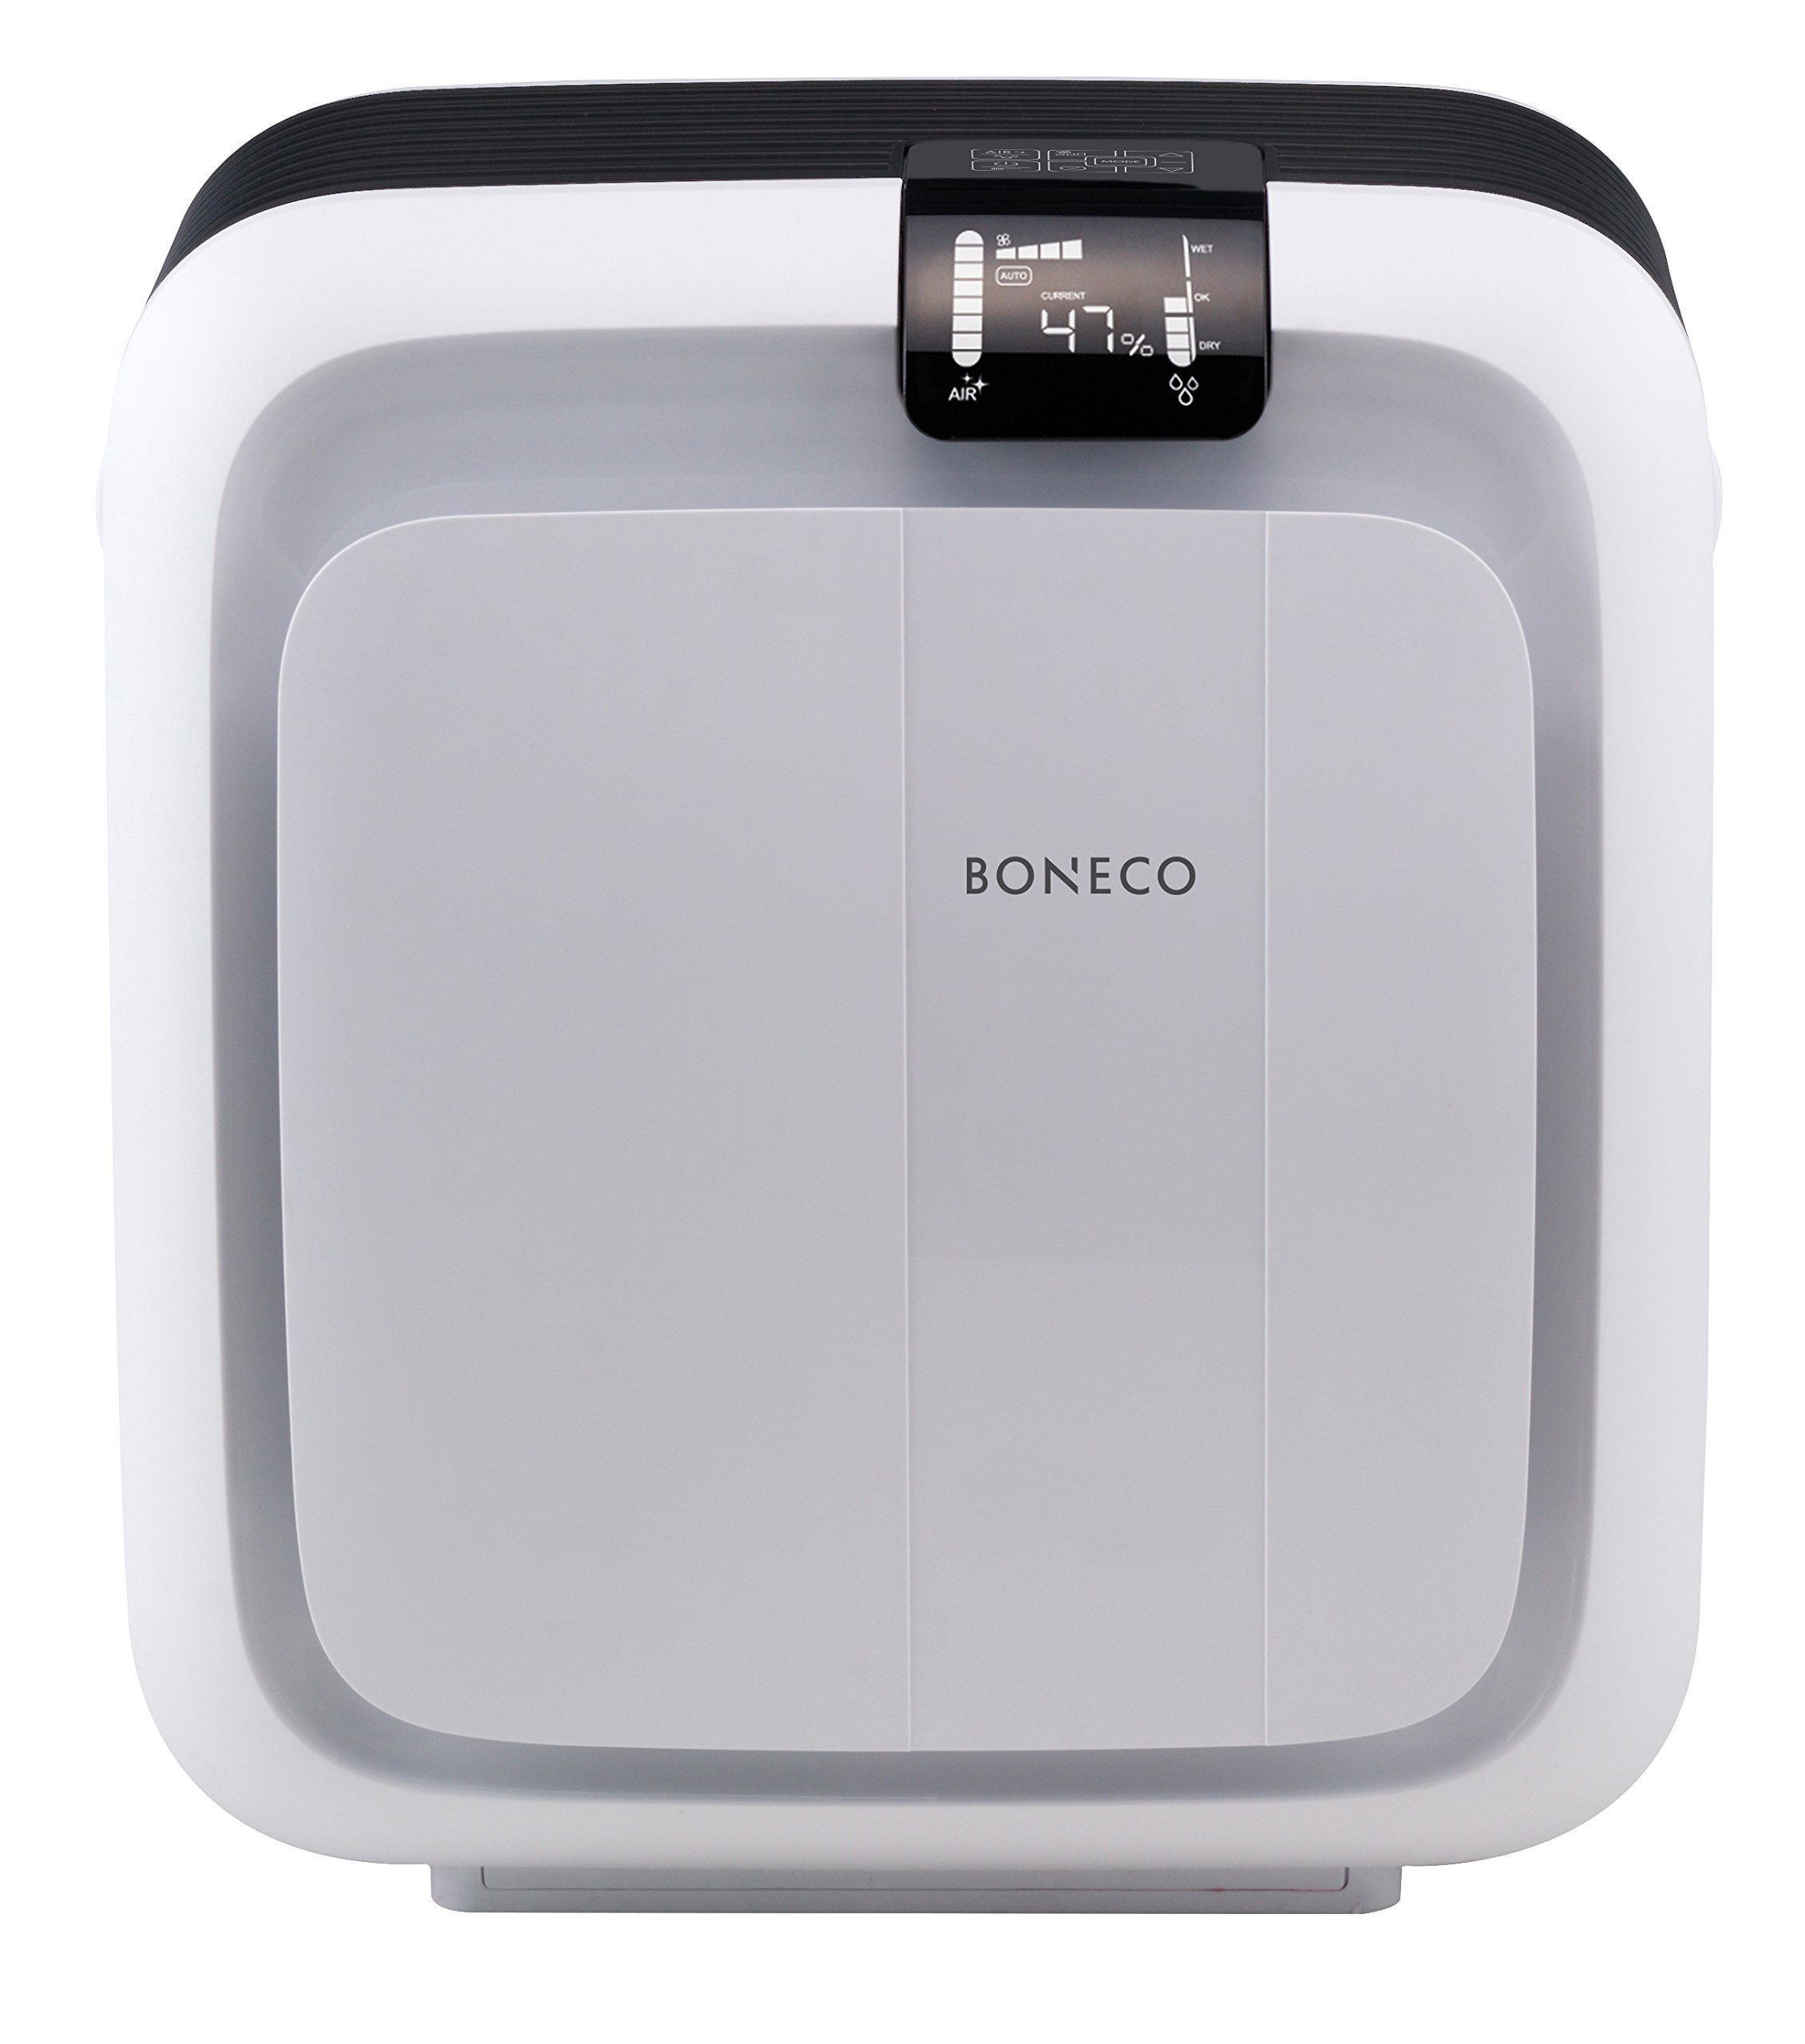 81Zdw38%2B5UL - Boneco H680 Hybrid Air Purifier and Humidifier, 10 Litre, 30 W, White